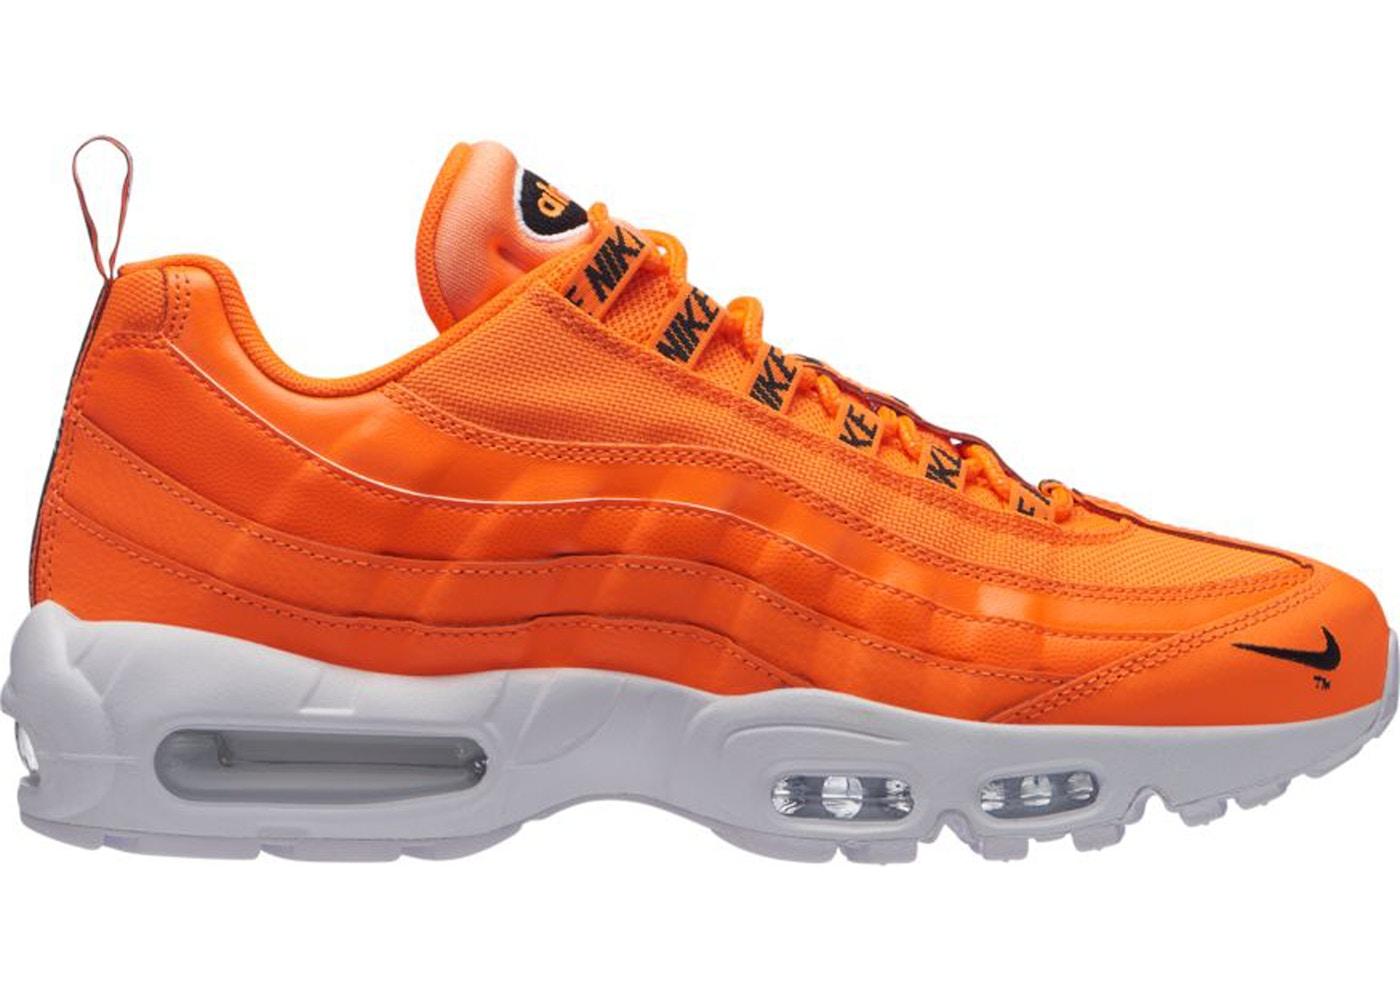 Nike Air Max 95 Overbranding Total Orange